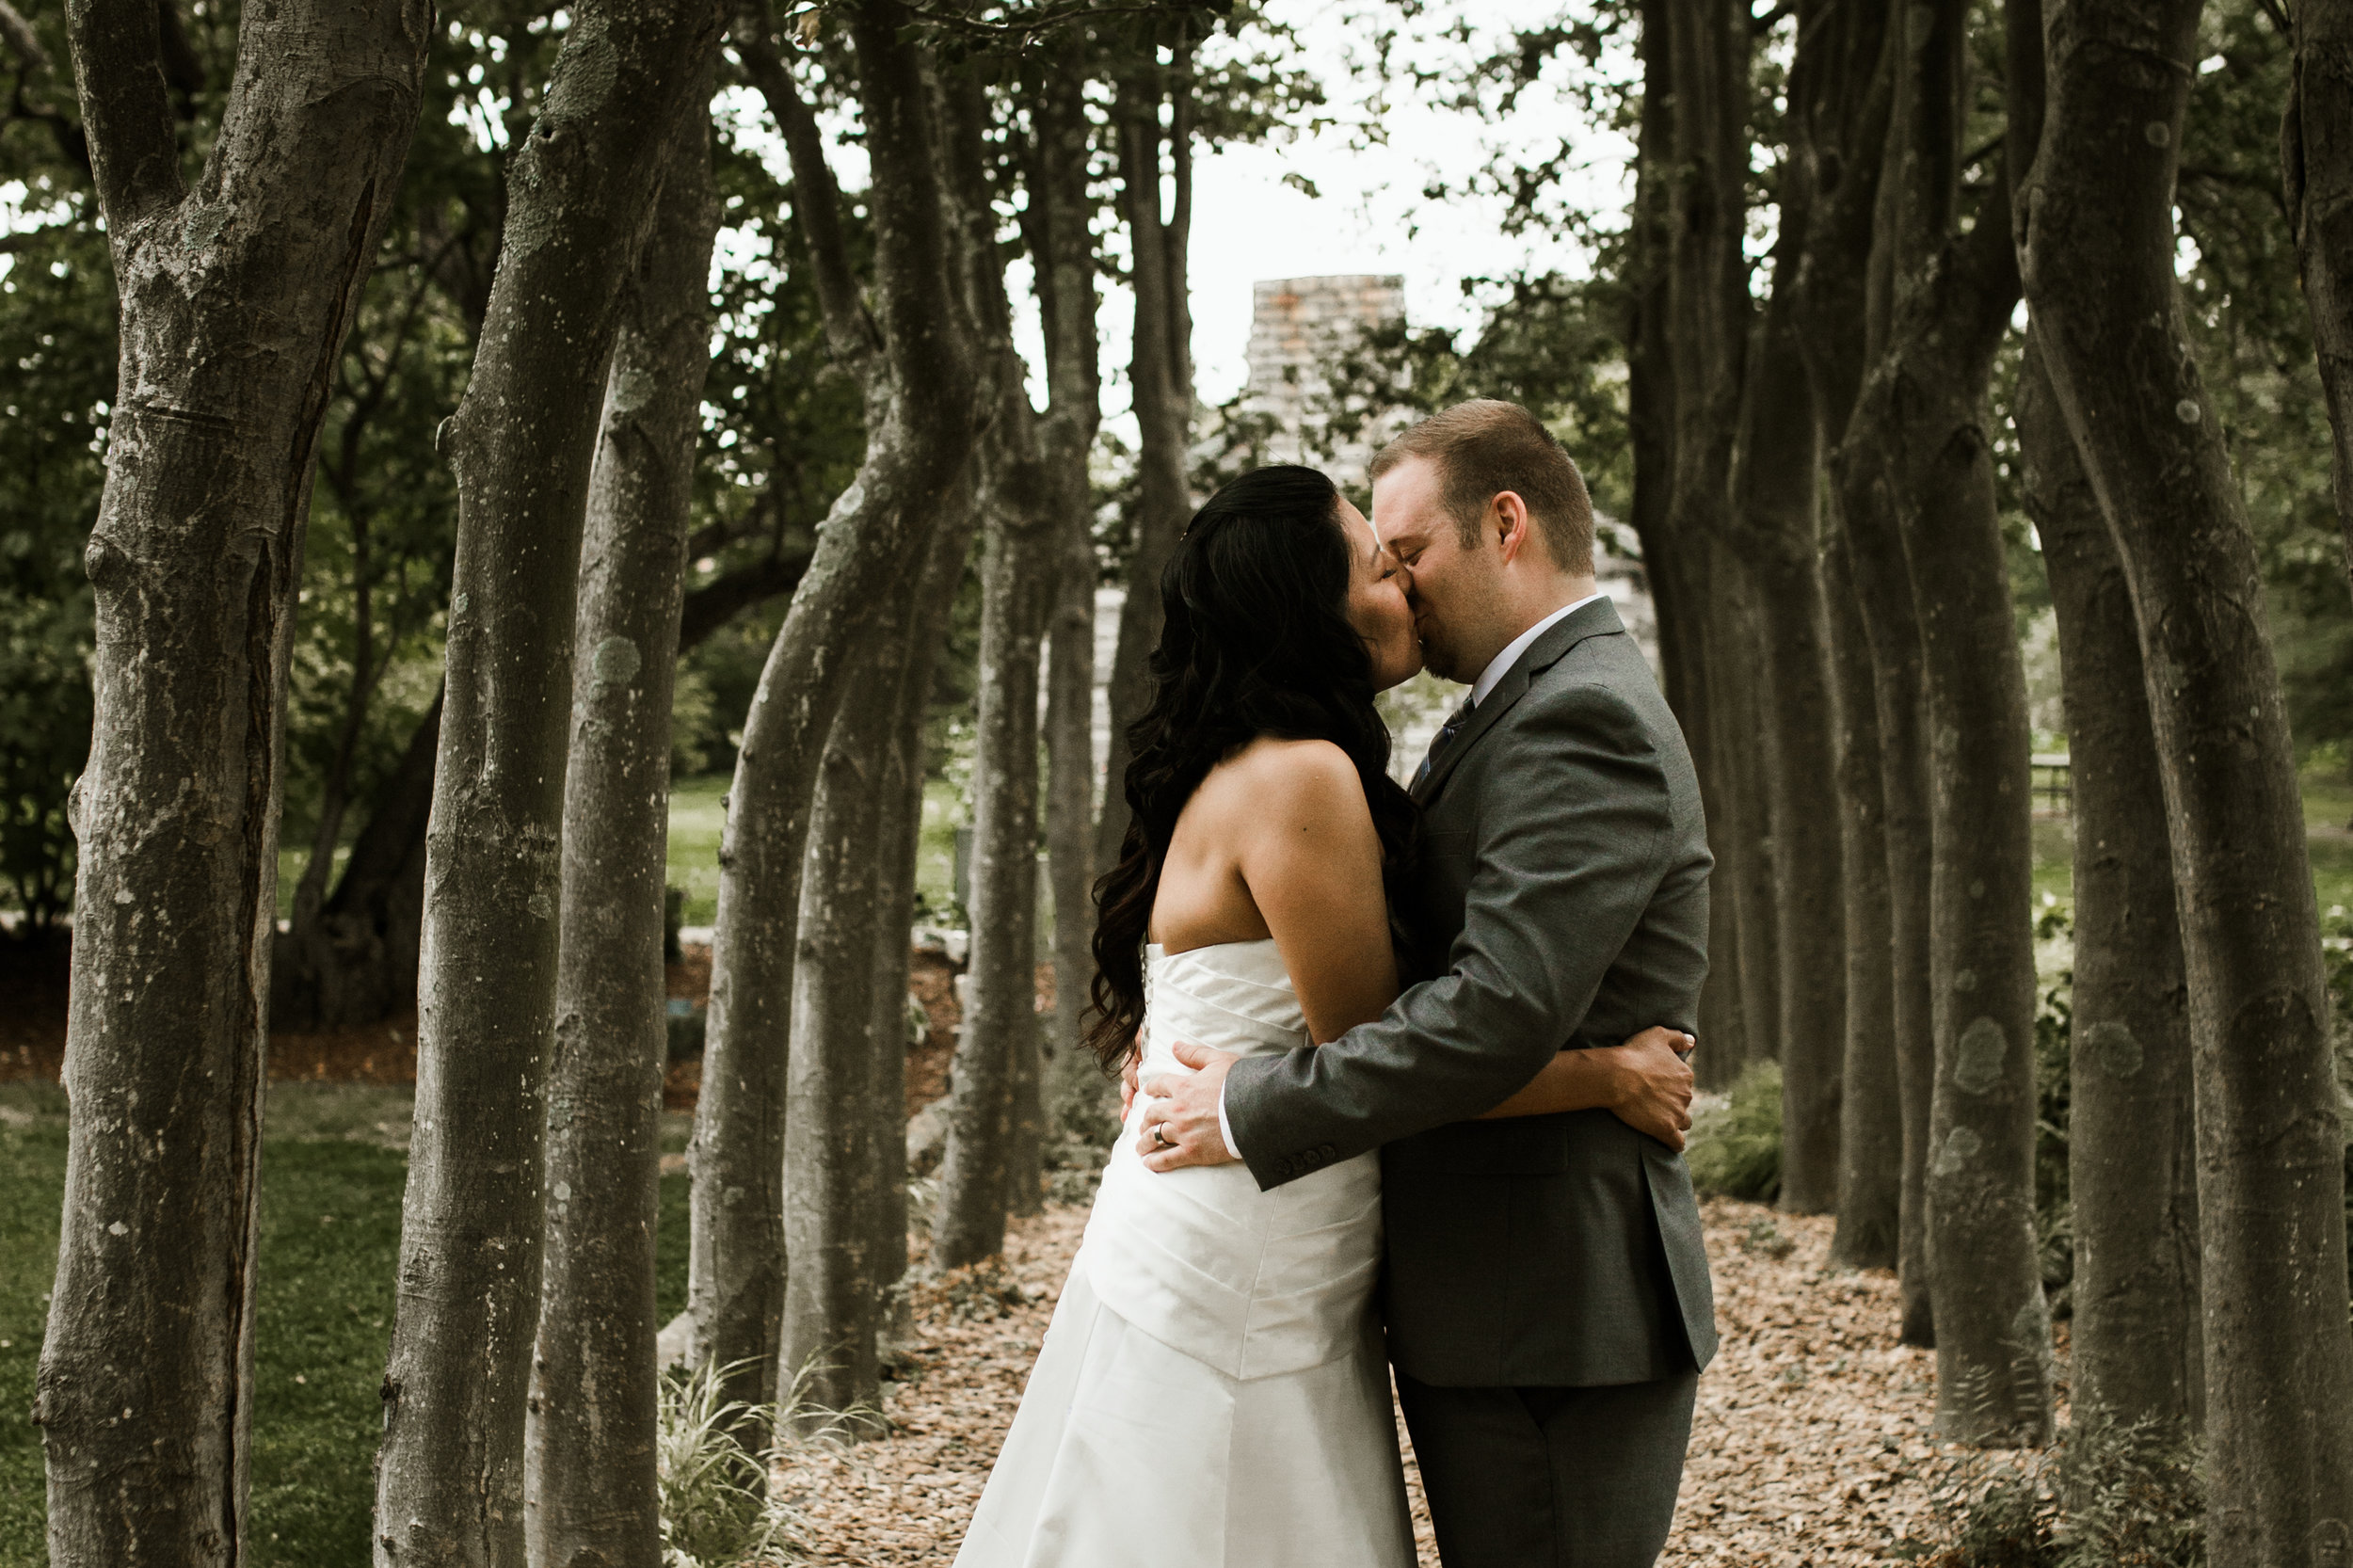 Kentucky Wedding Louisville Wedding Photographer 2018 Crystal Ludwick Photo Louisville Wedding Photographer Kentucky Wedding Photographer (59 of 76).jpg